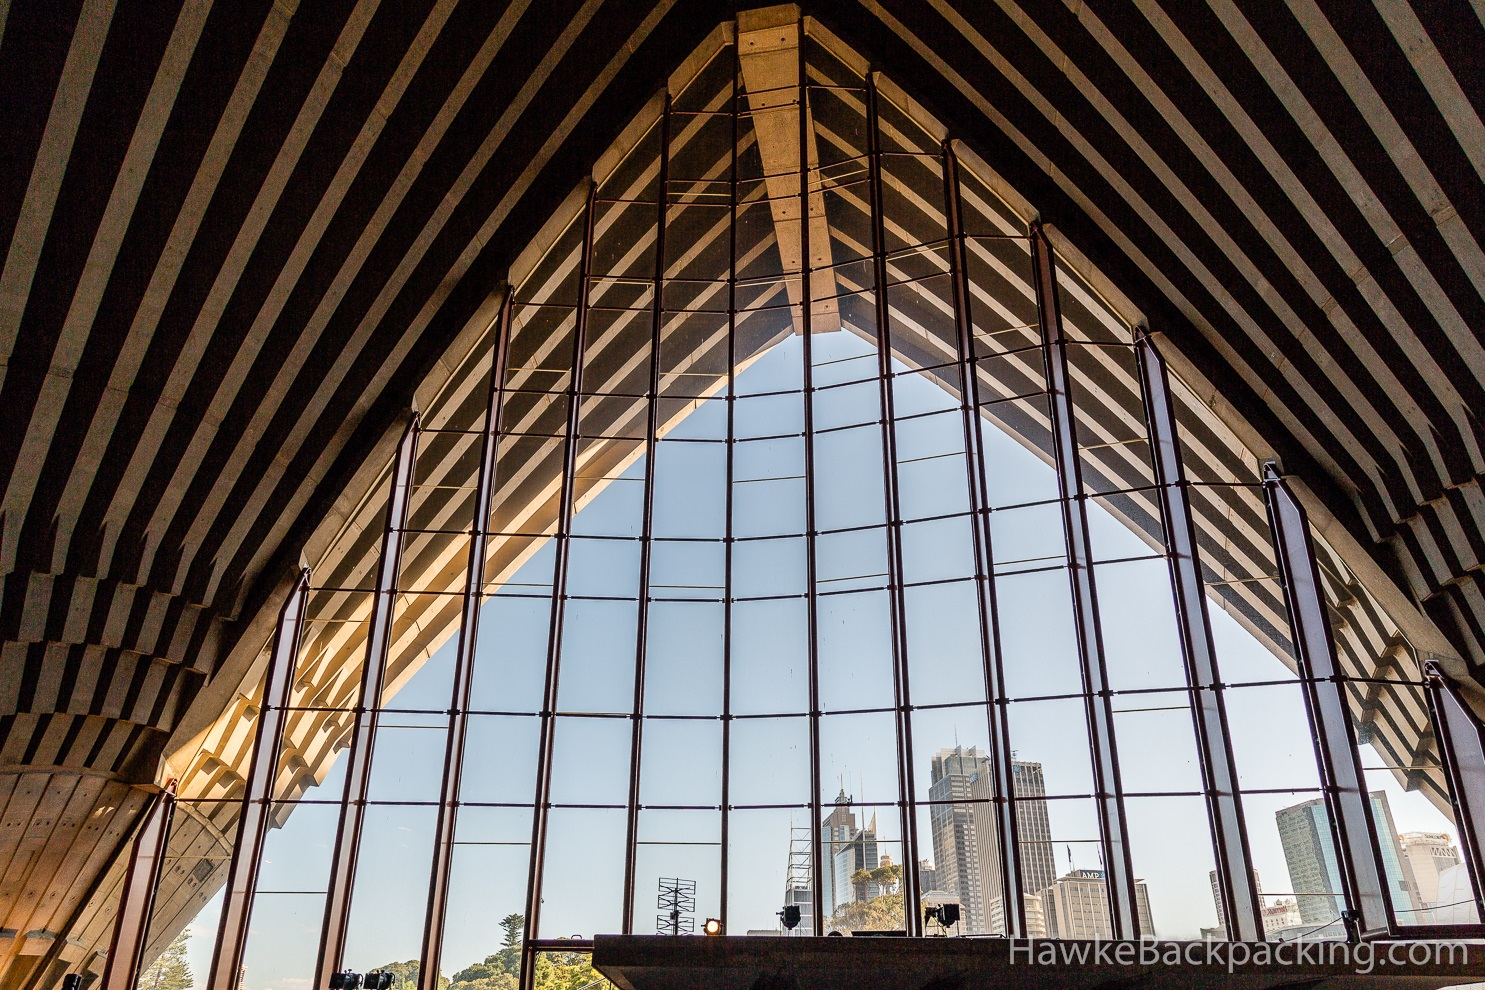 Sydney Opera House Hawkebackpacking Com